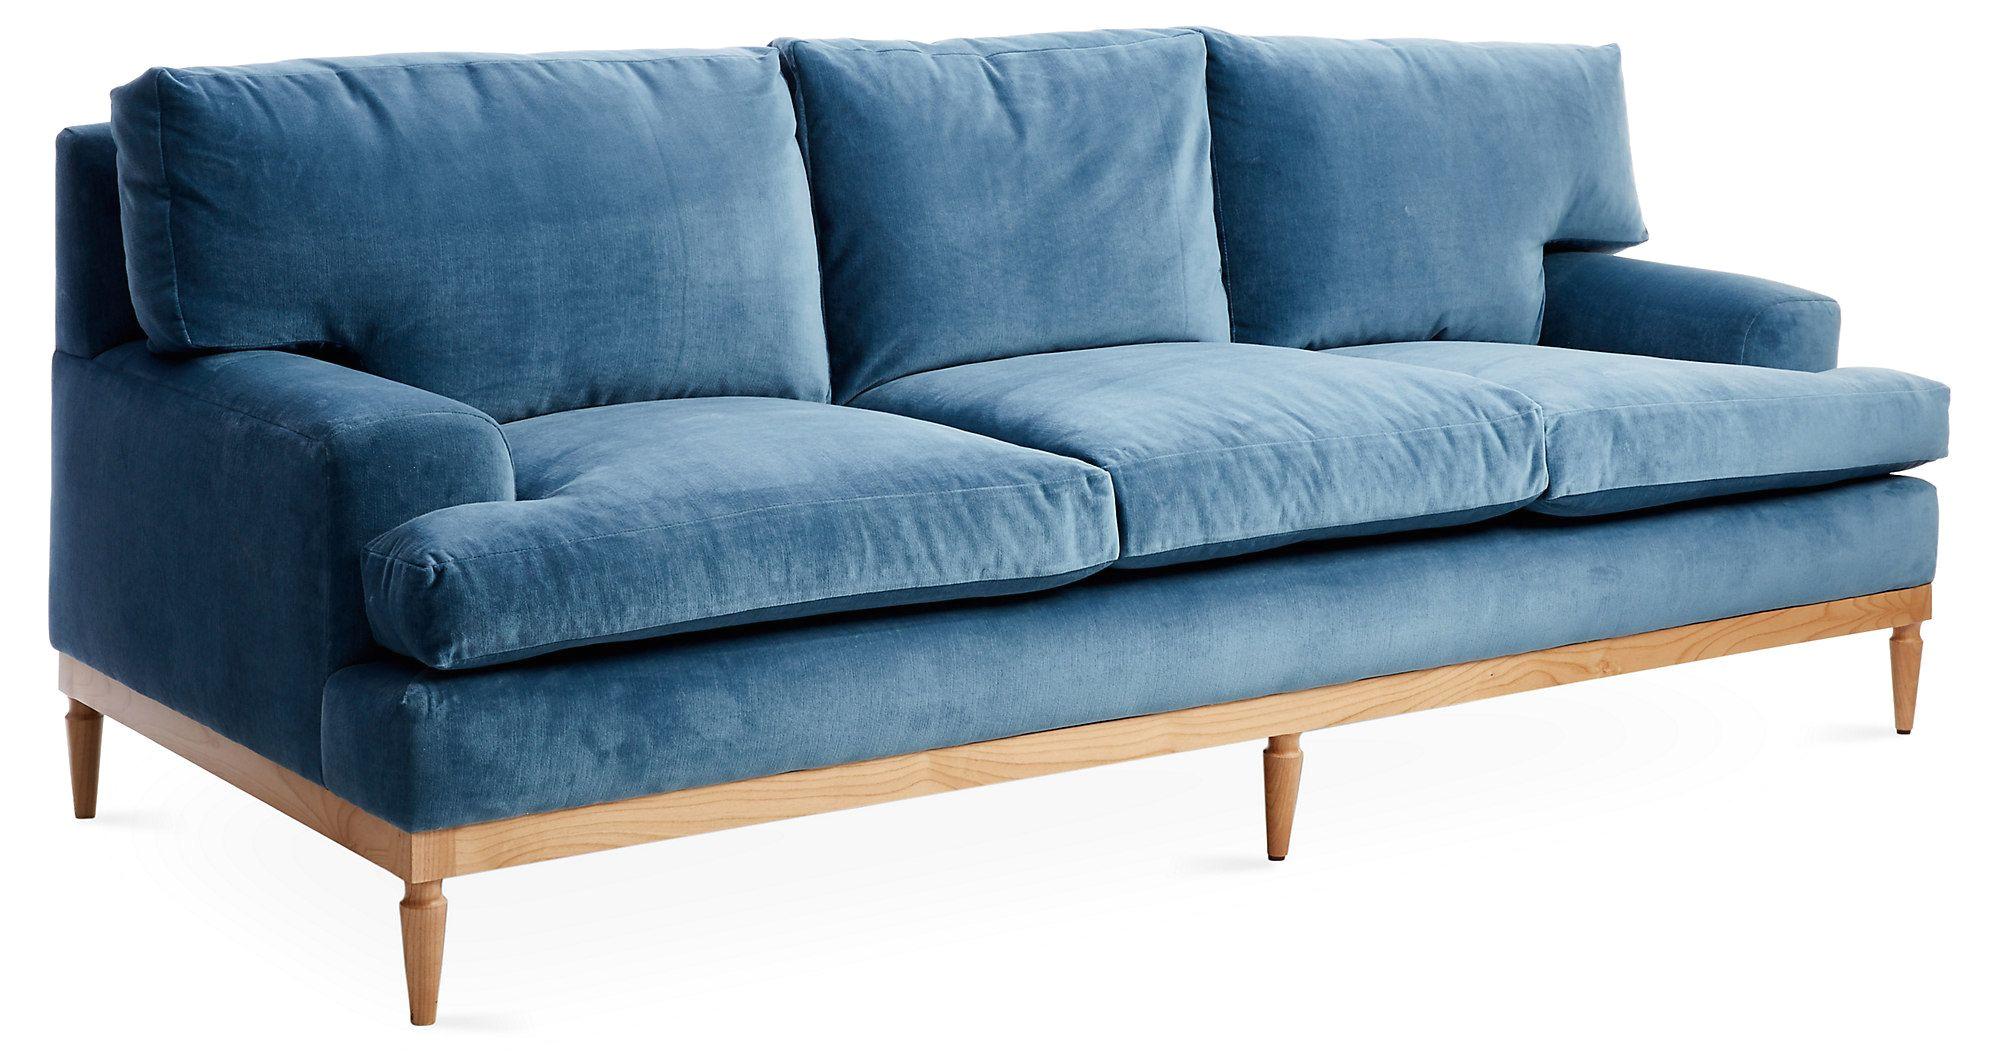 english roll arm sofa tight back luxury sutton 89 quot sofa harbor blue velvet e kings